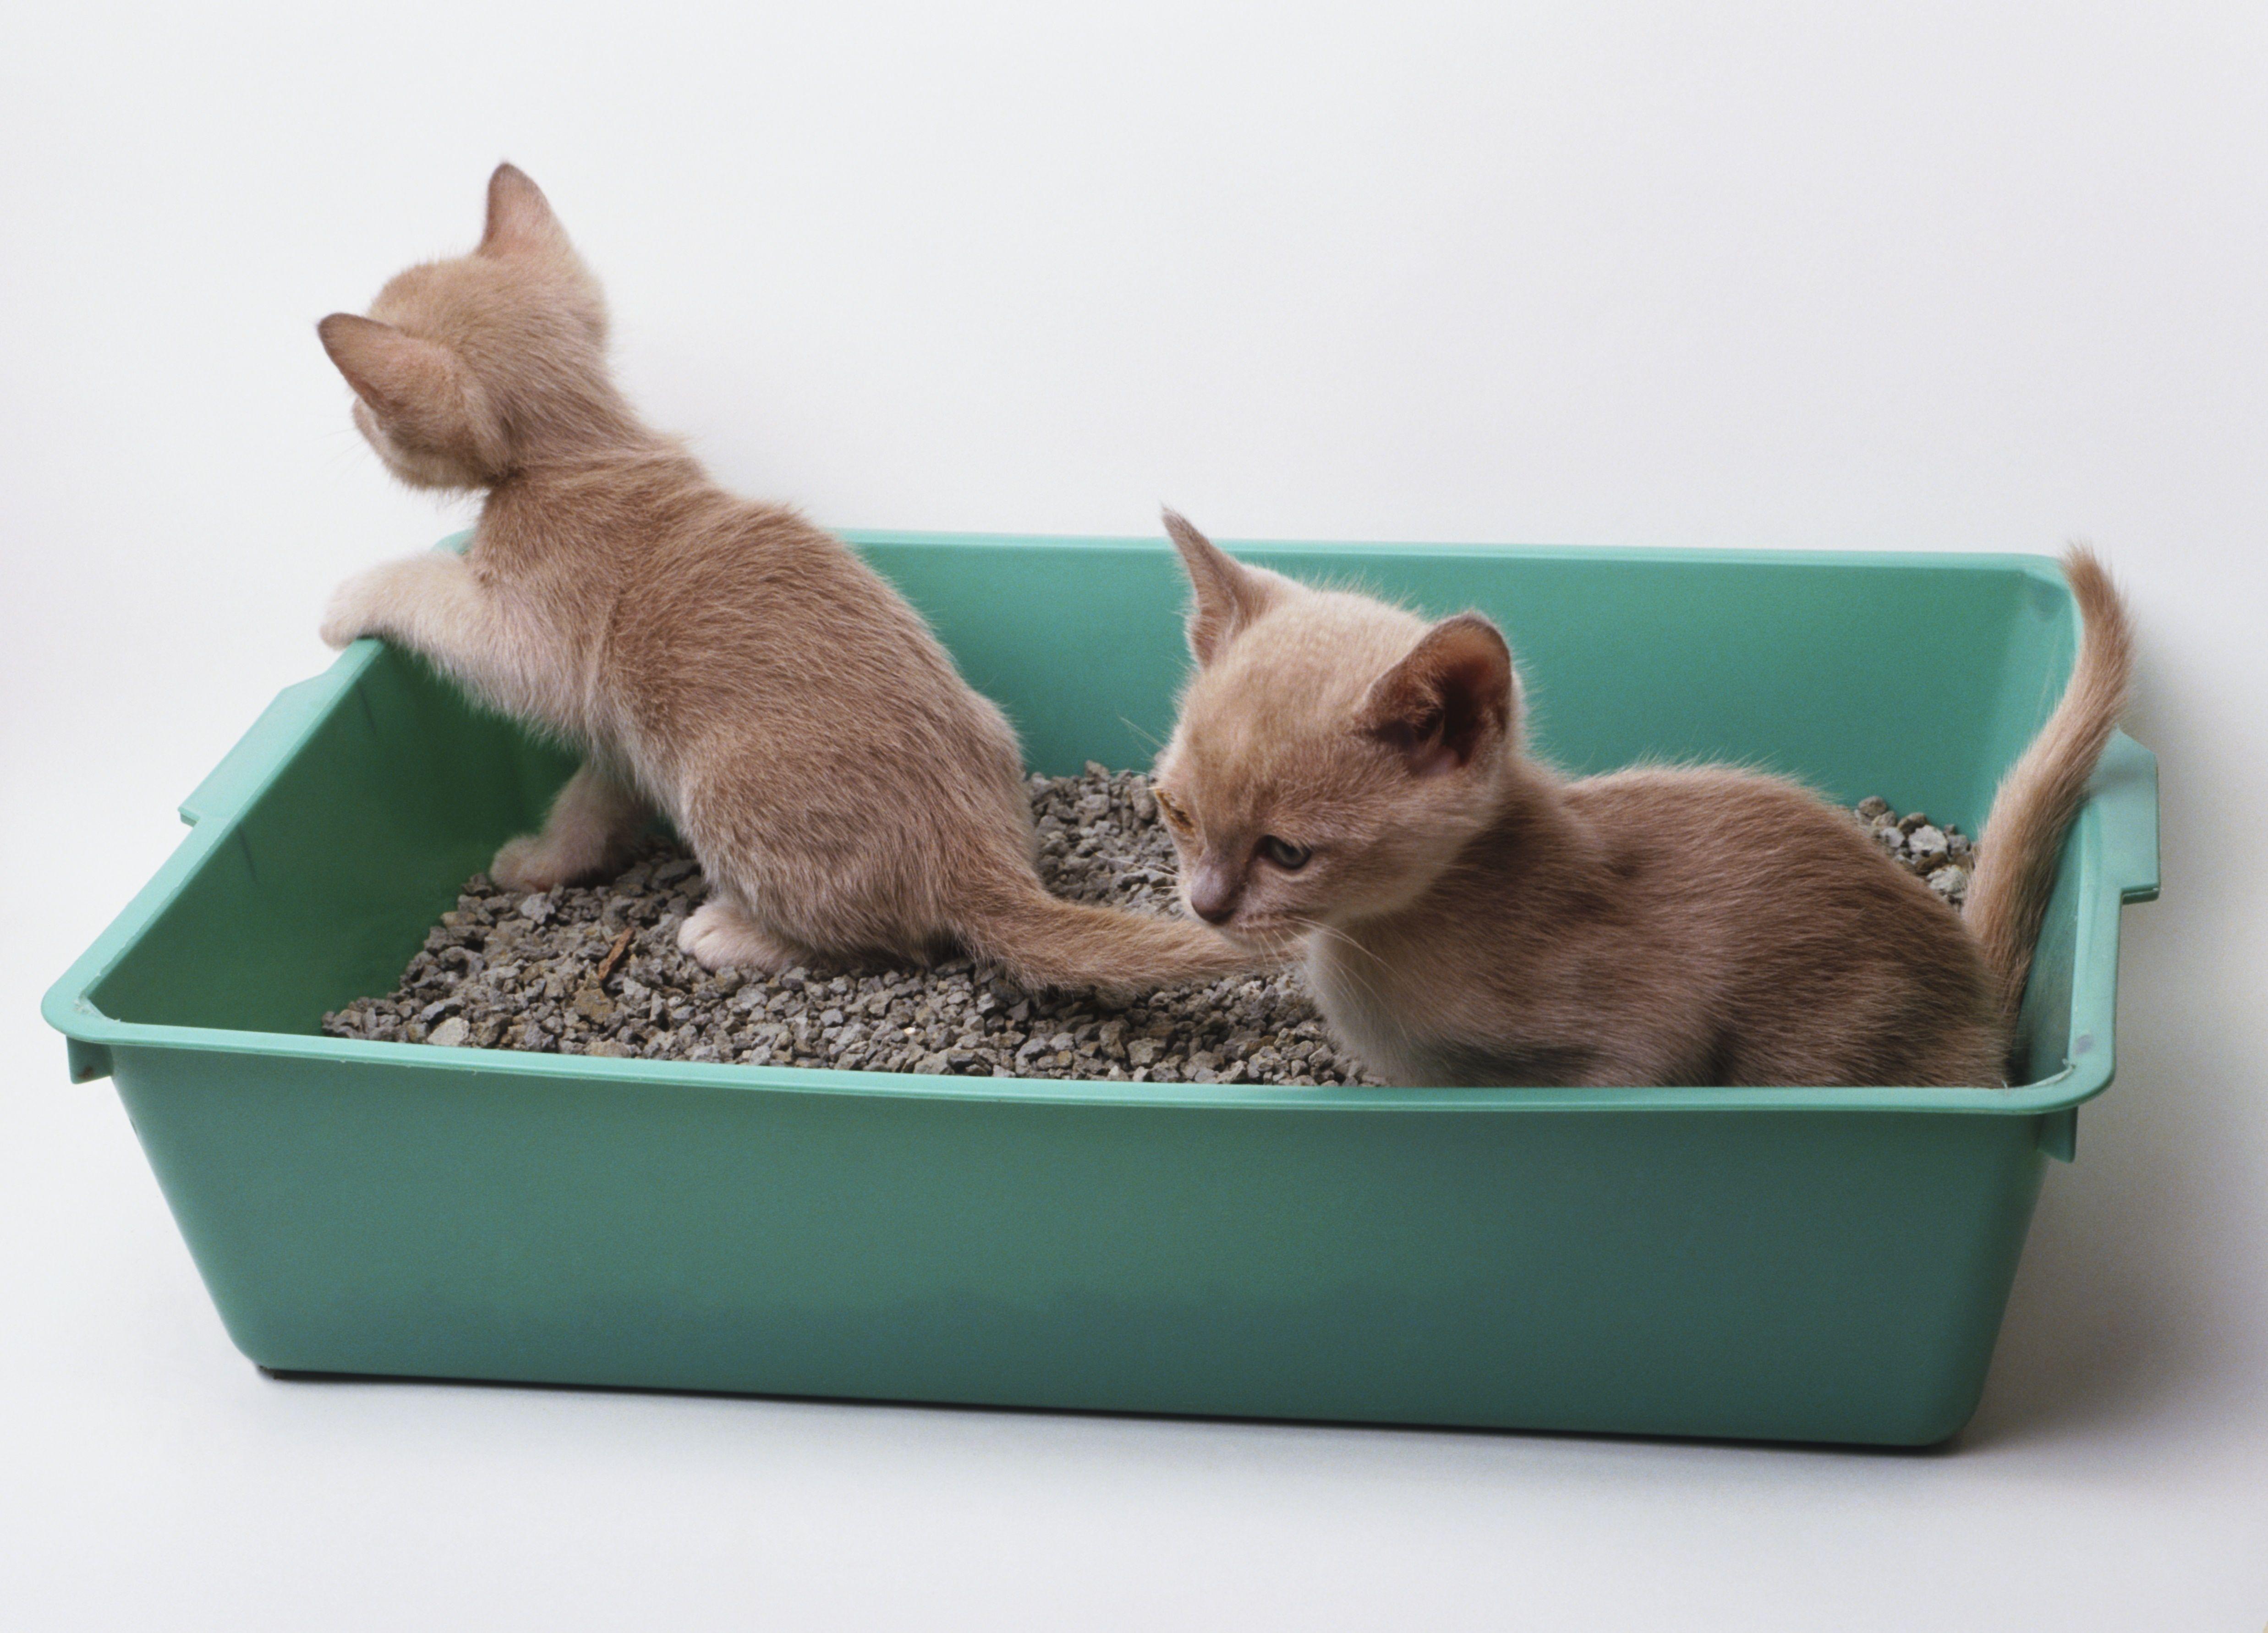 Two greyish-brown kittens (Felis silvestris catus) in green plastic litter tray